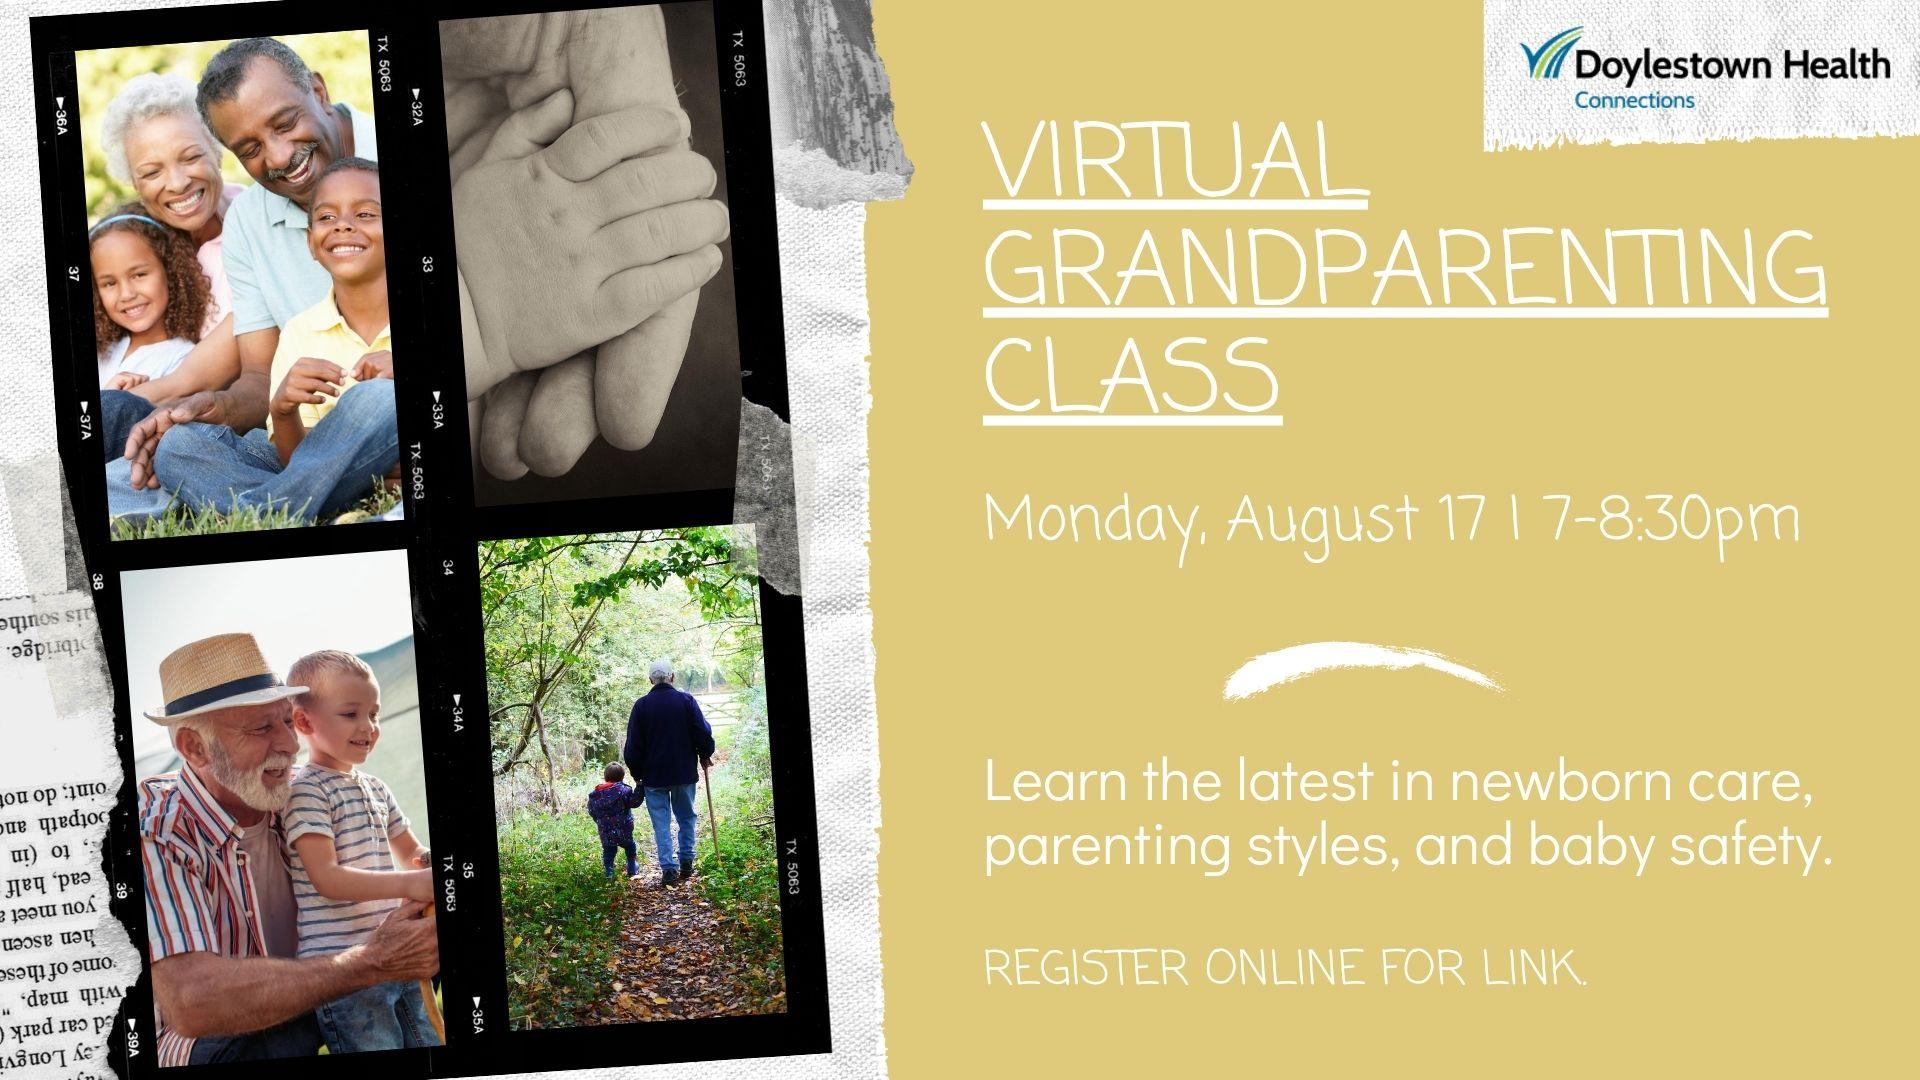 Virtual Grandparenting Class